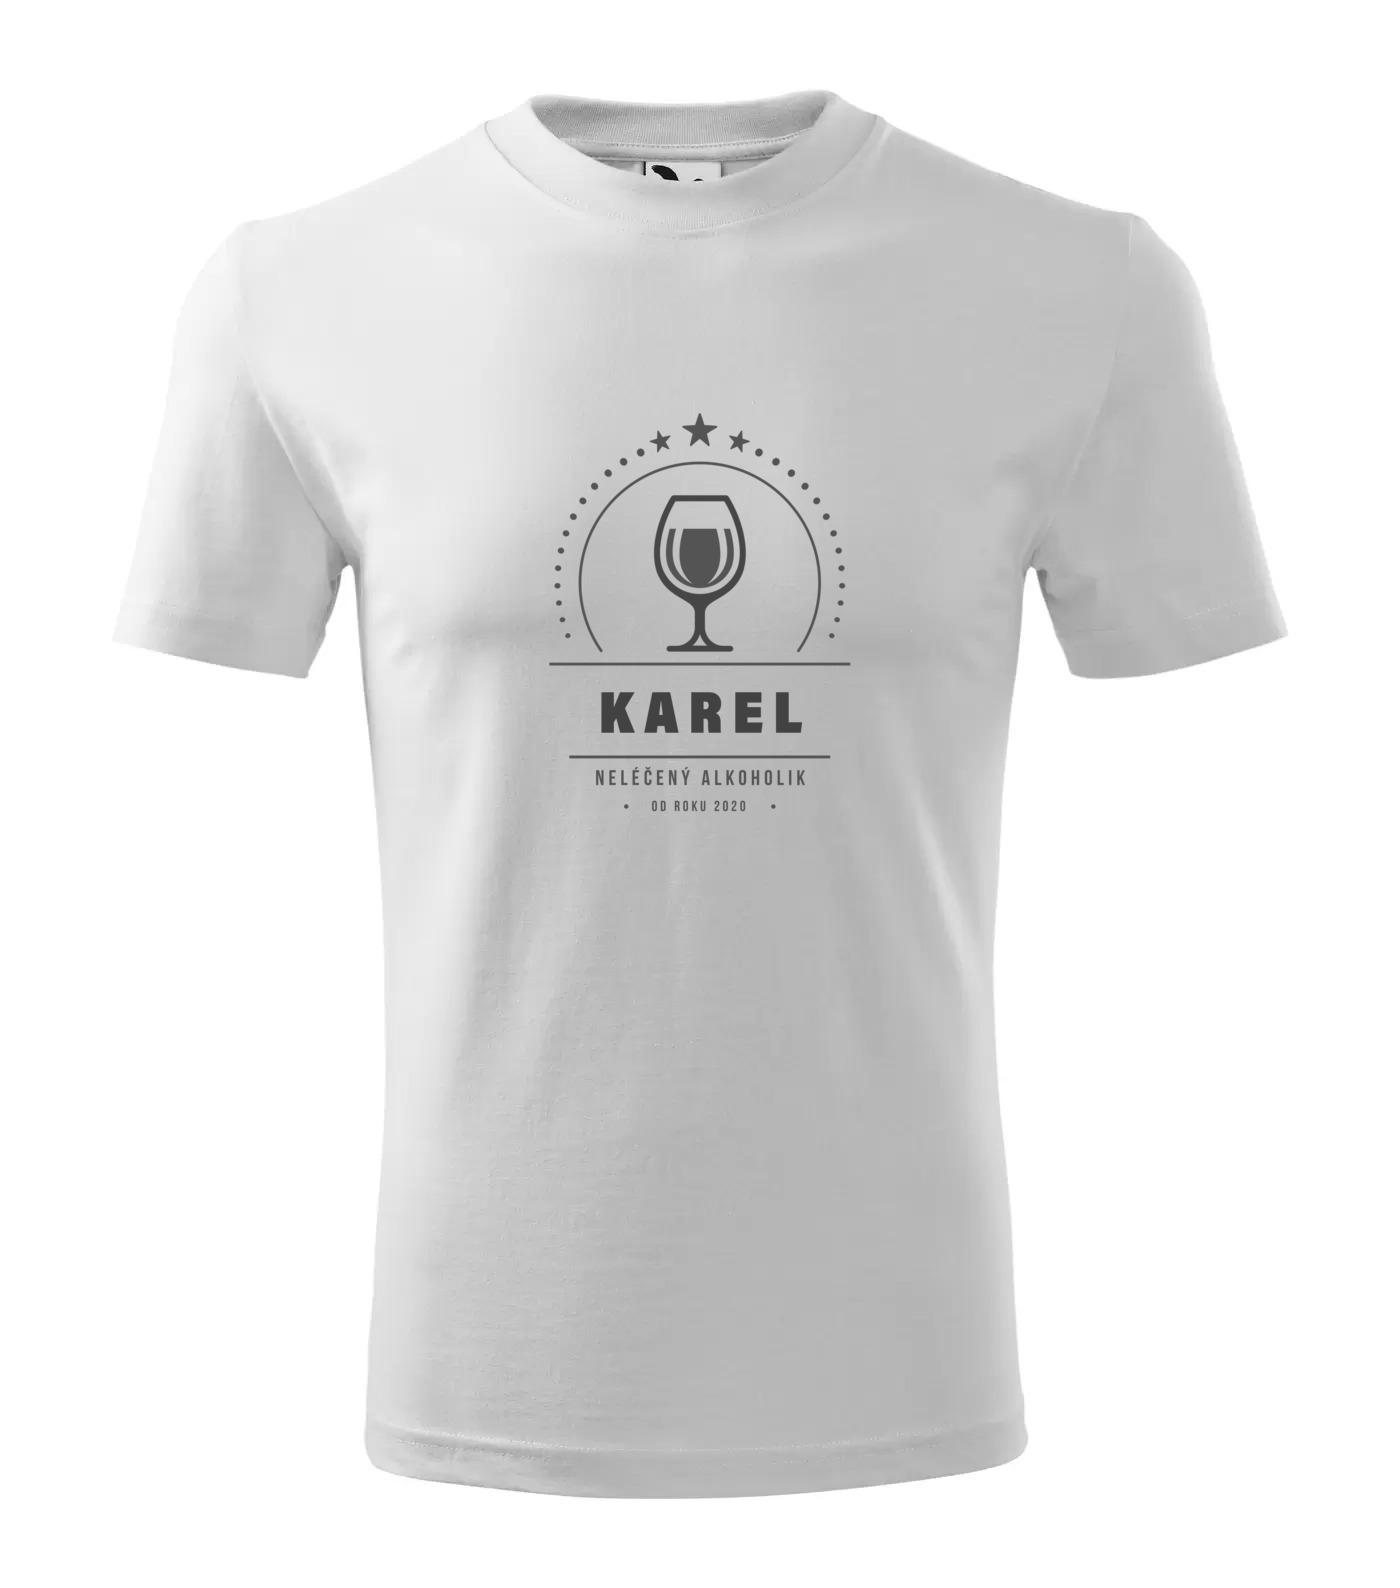 Tričko Alkoholik Karel